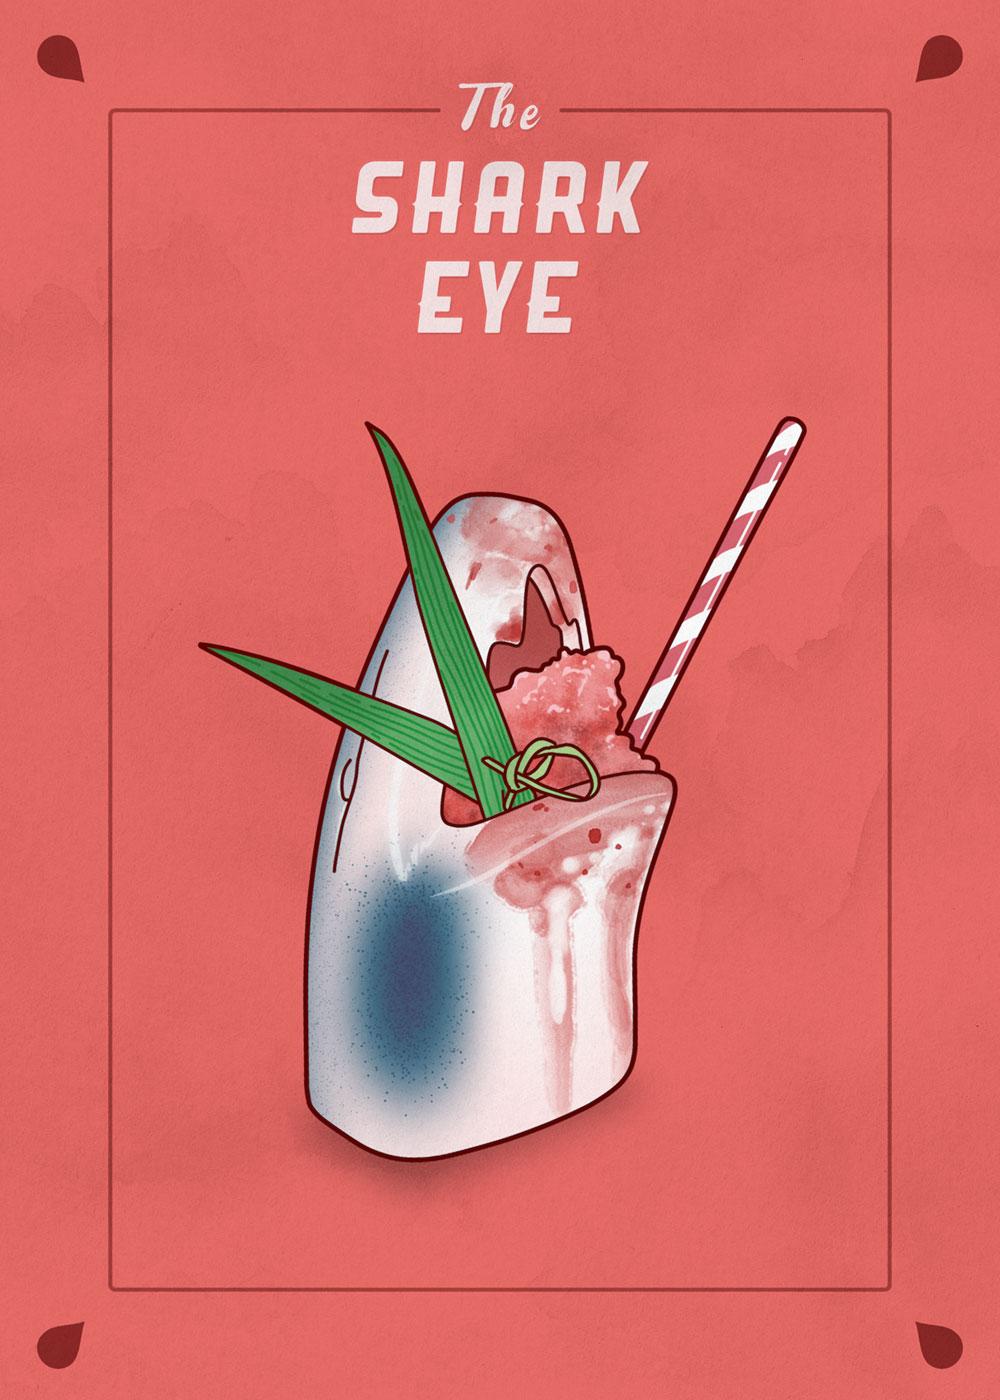 The Shark Eye